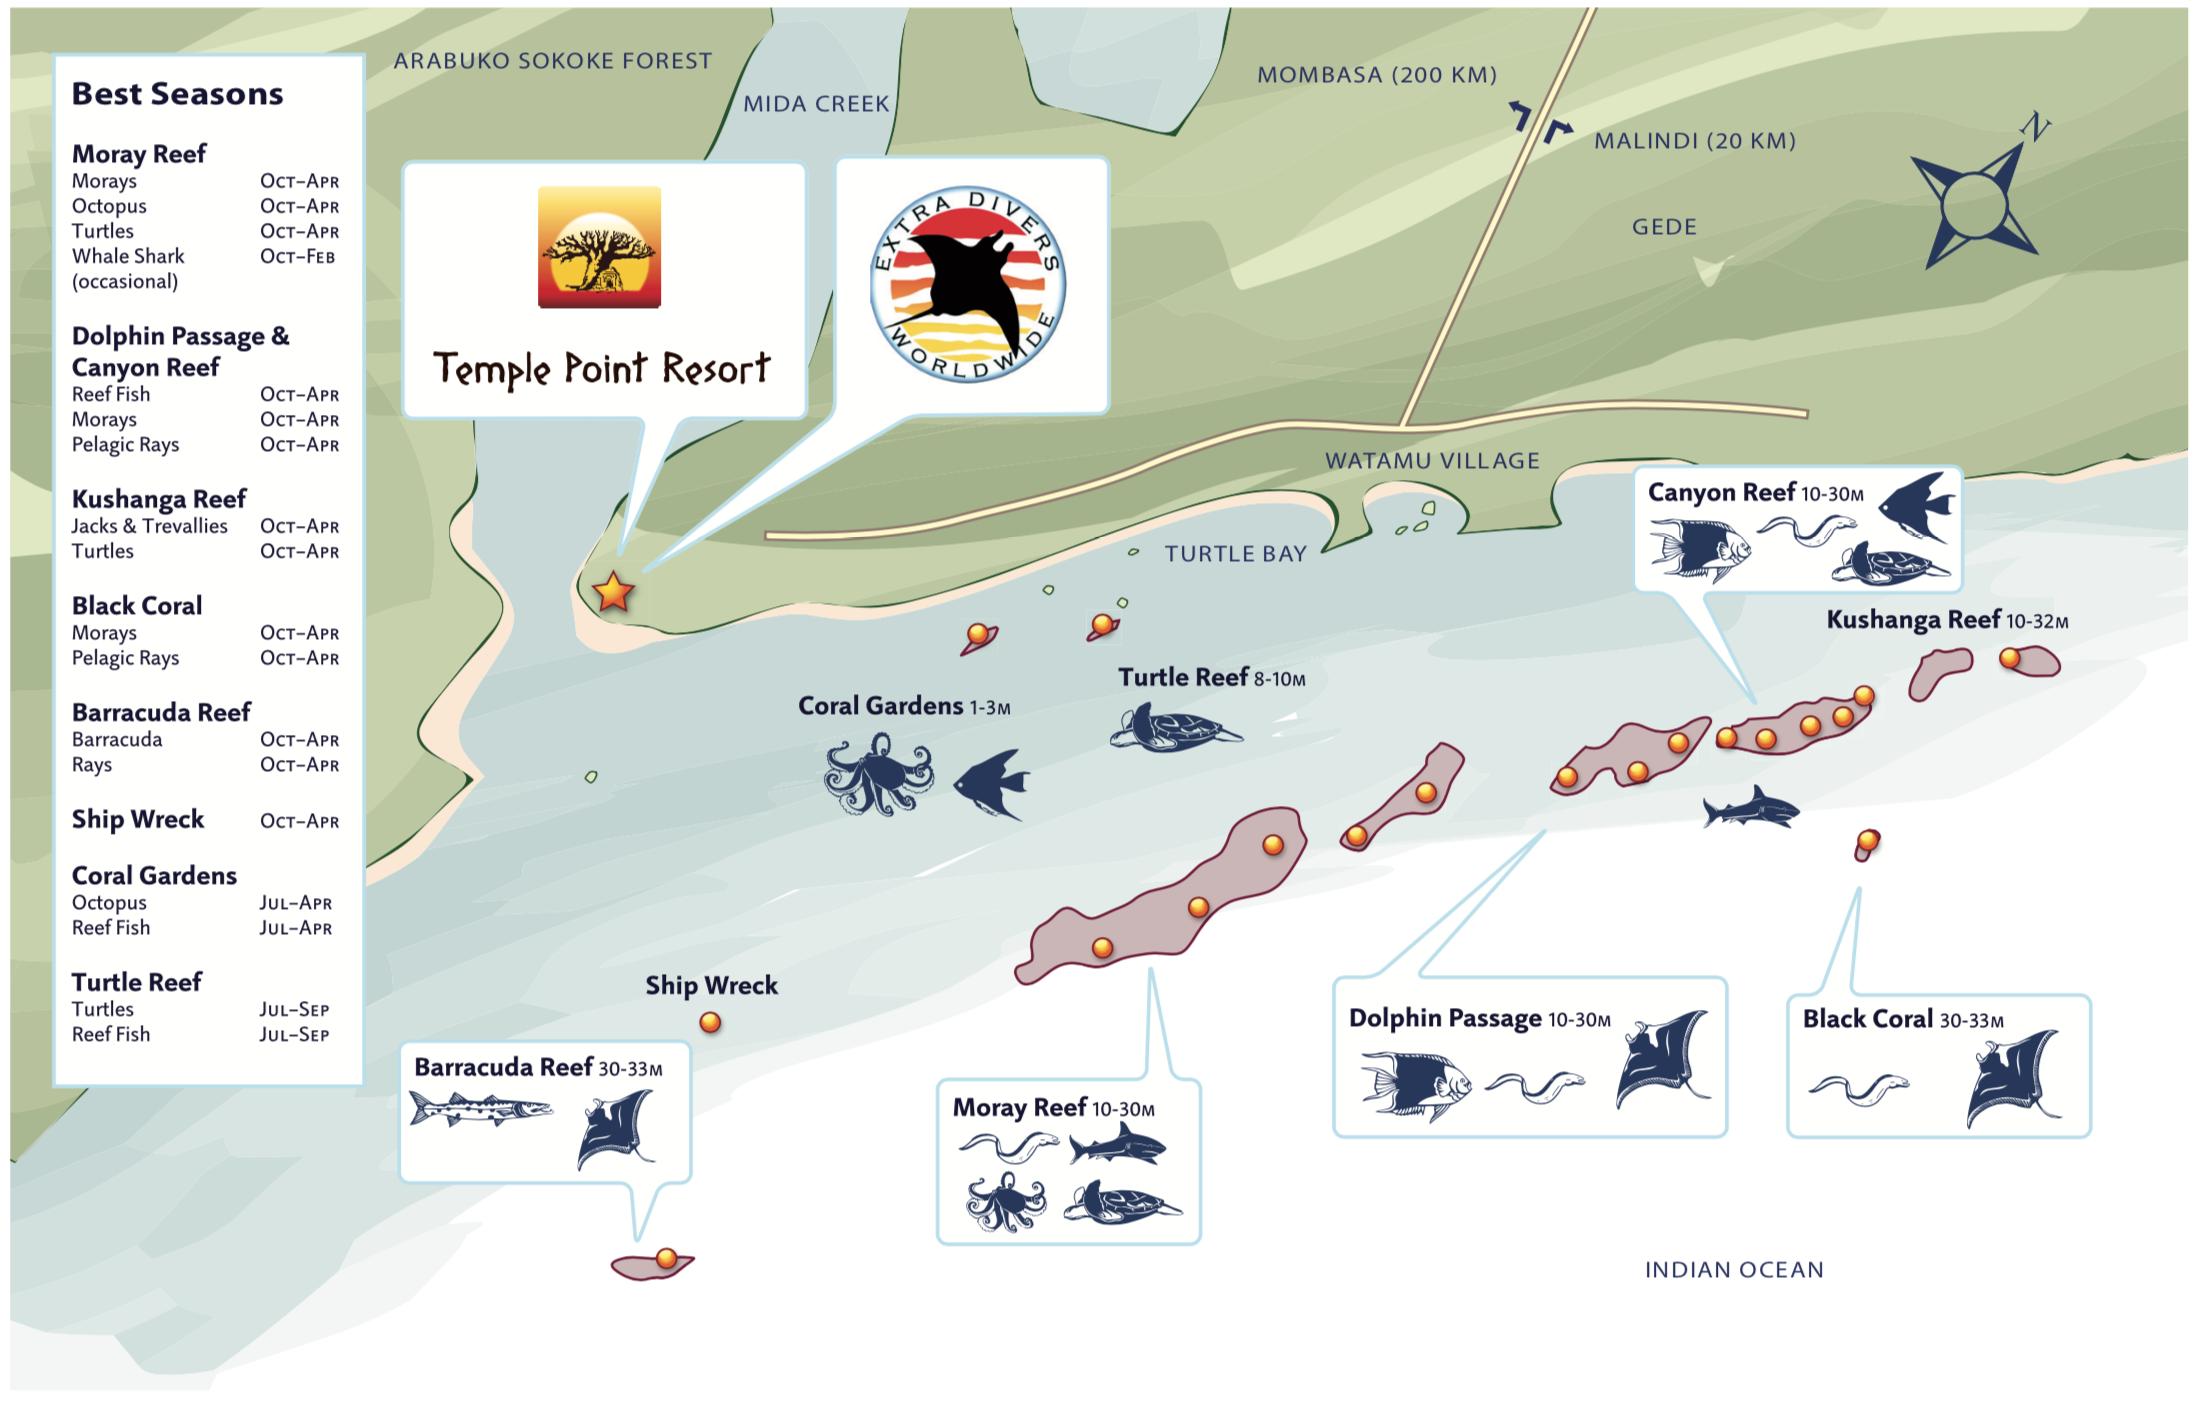 Dive Spots Watamu Marine National Park+.png